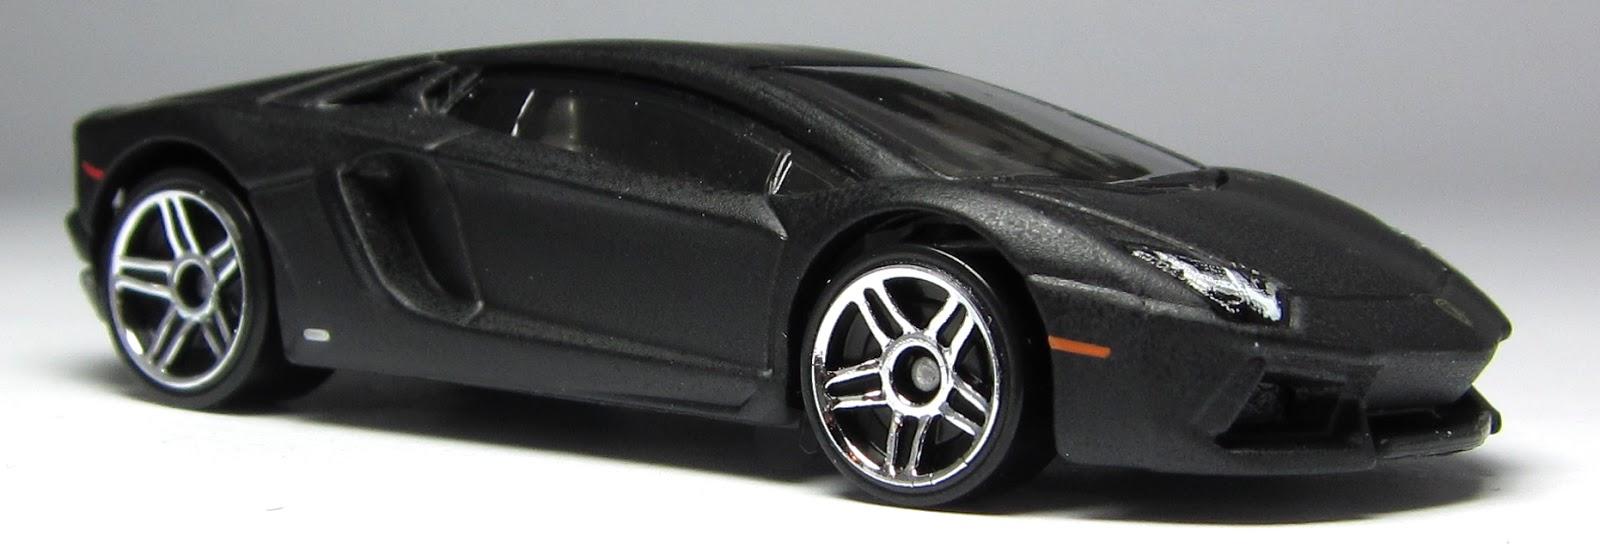 First Look: 2013 Hot Wheels Lamborghini Aventador in black ...